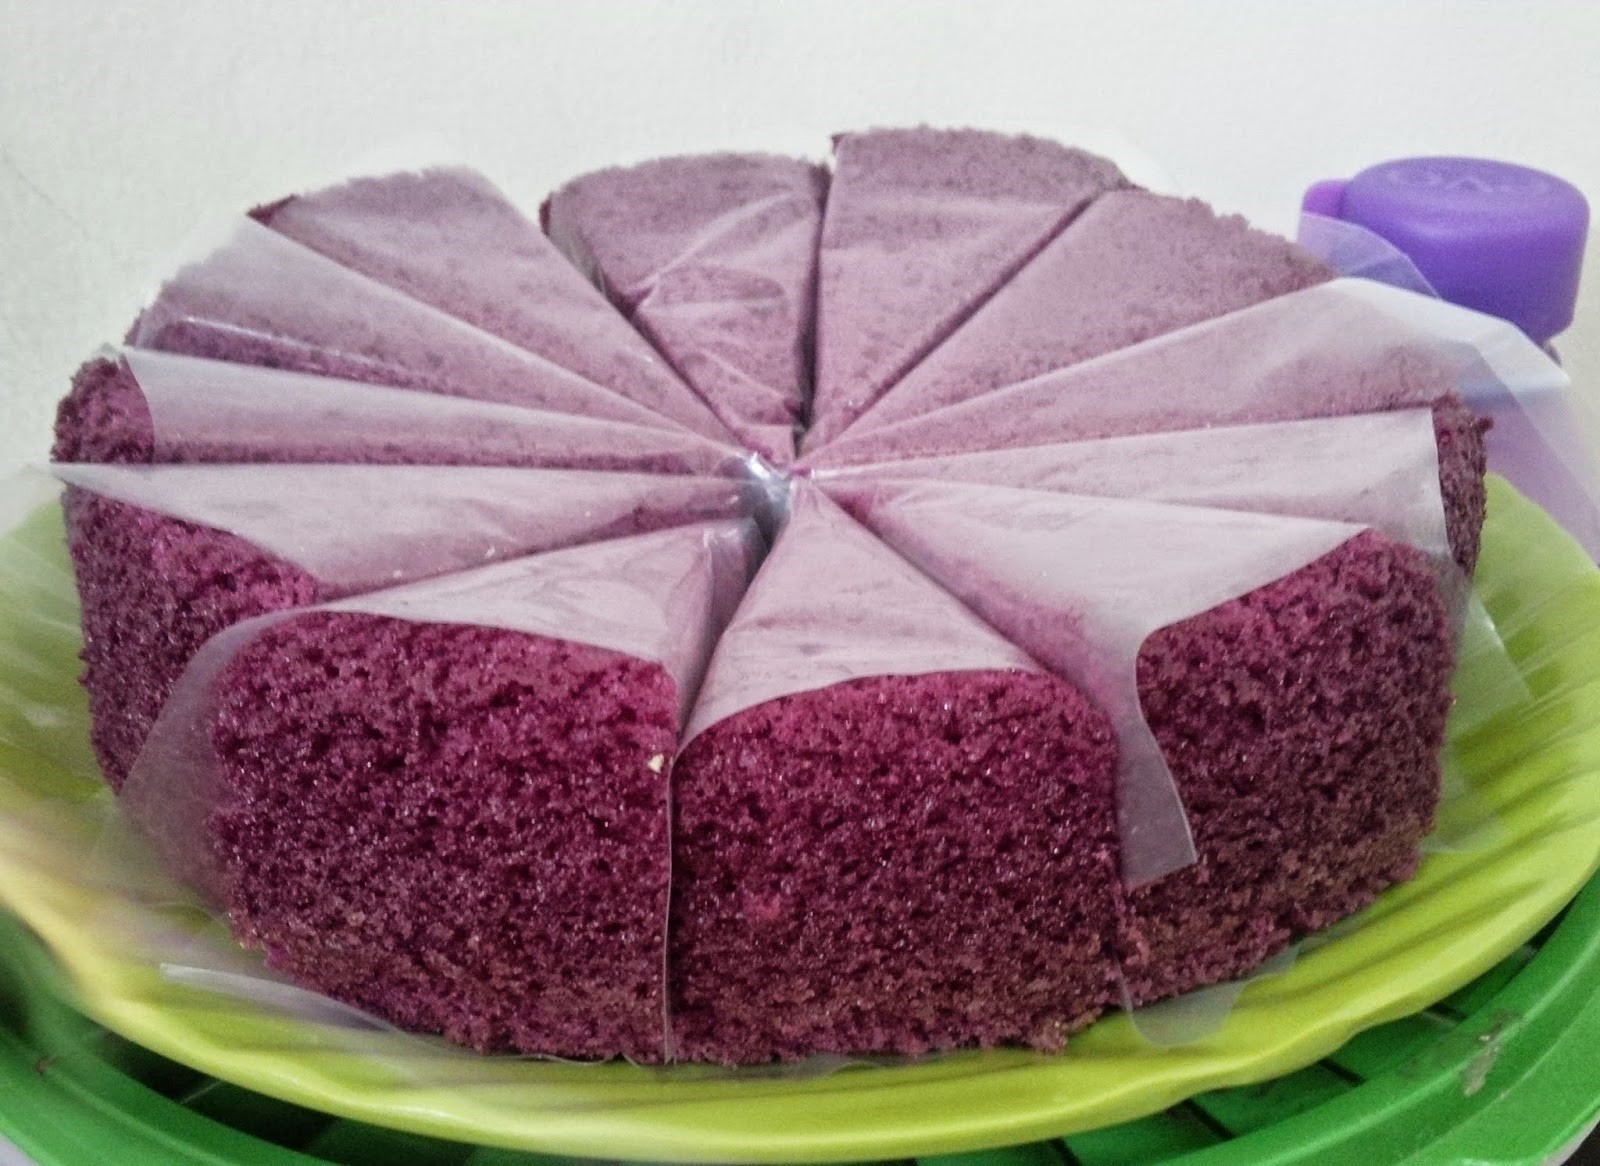 Cake Ubi Ungu, Bisa Jadi Variasi Kue Ulang Tahun Si Kecil Lho Moms